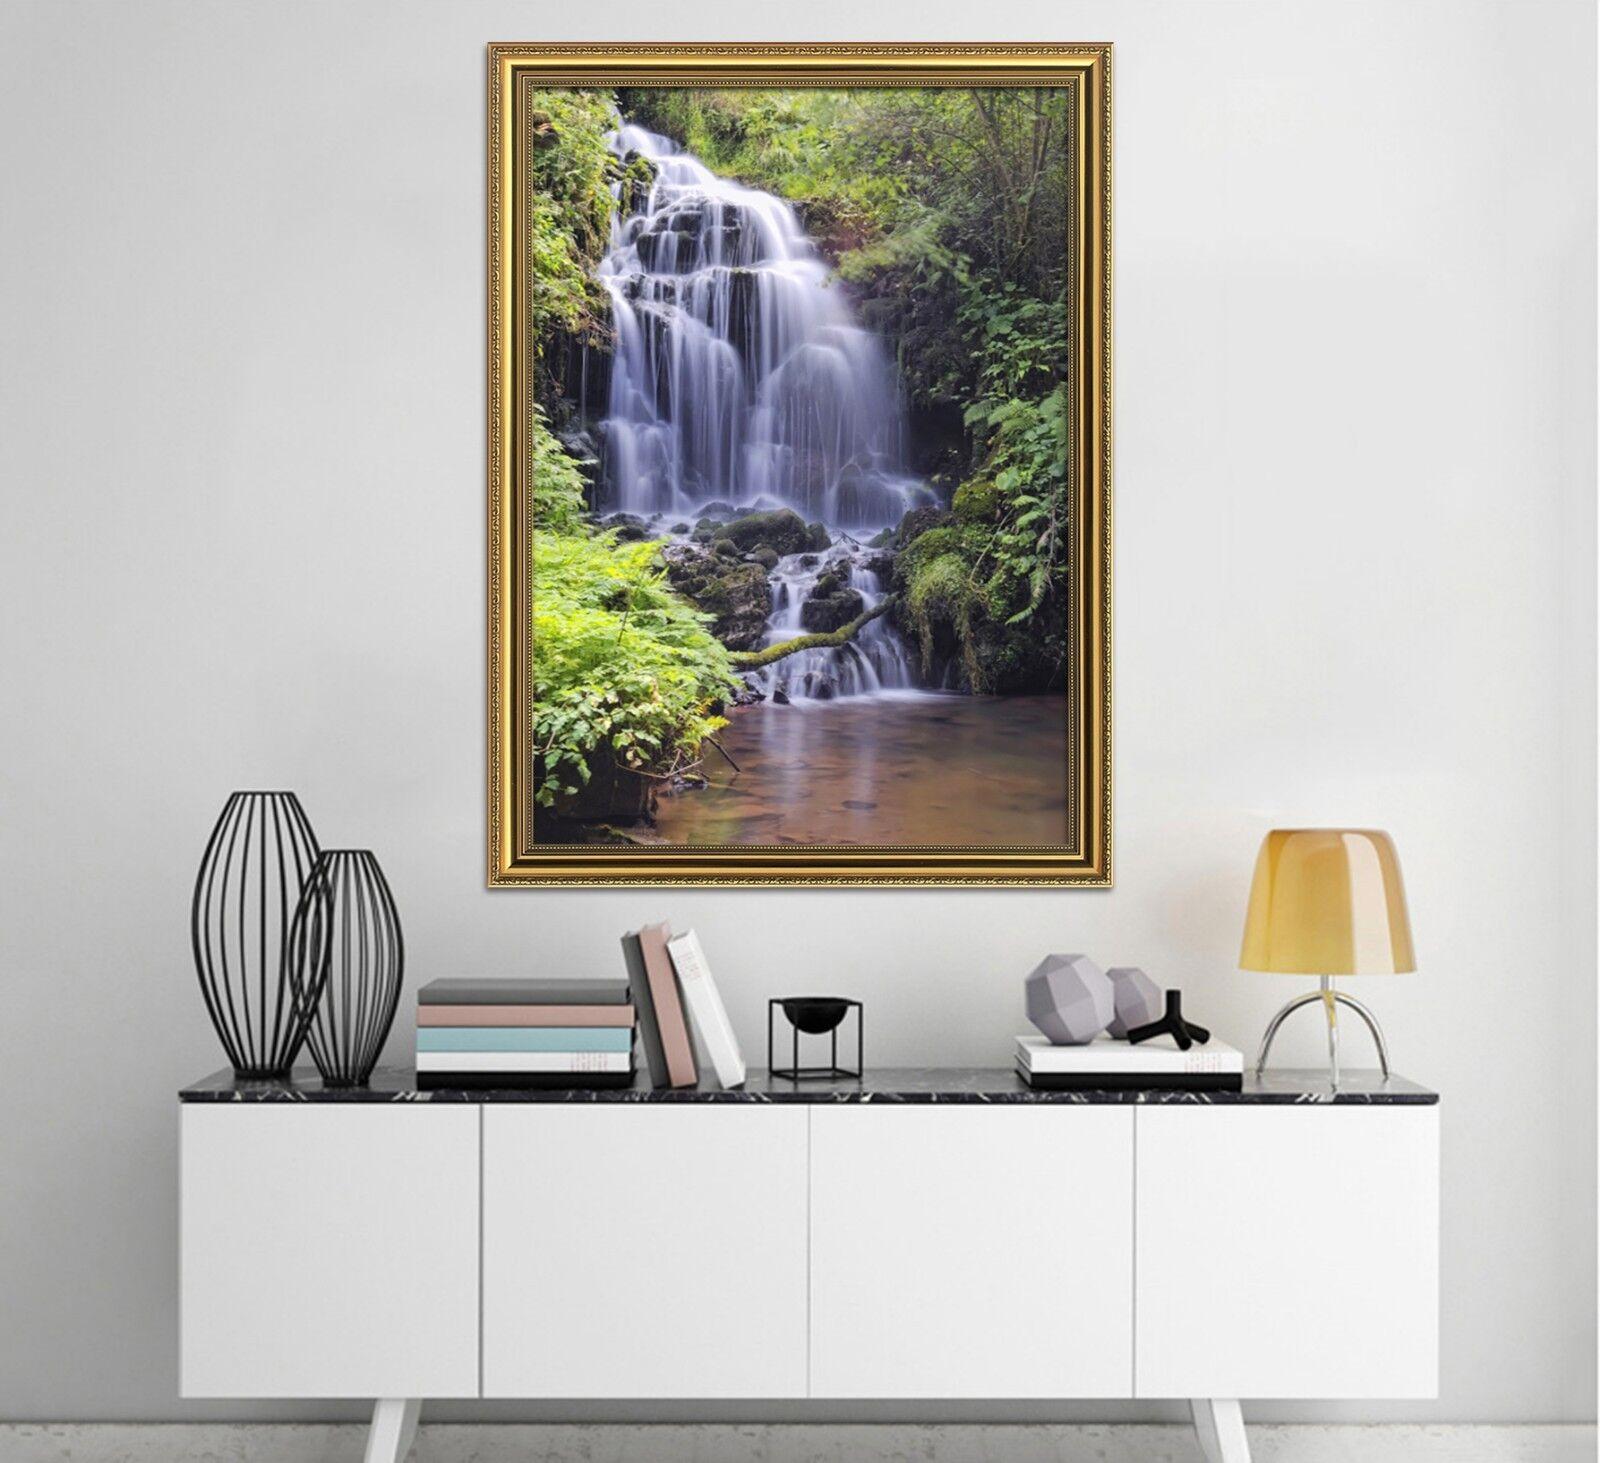 Cartel enmarcado 3D Cascada Tropical 2 Decoración del Hogar Pintura de Impresión Arte AJ Wallpaper